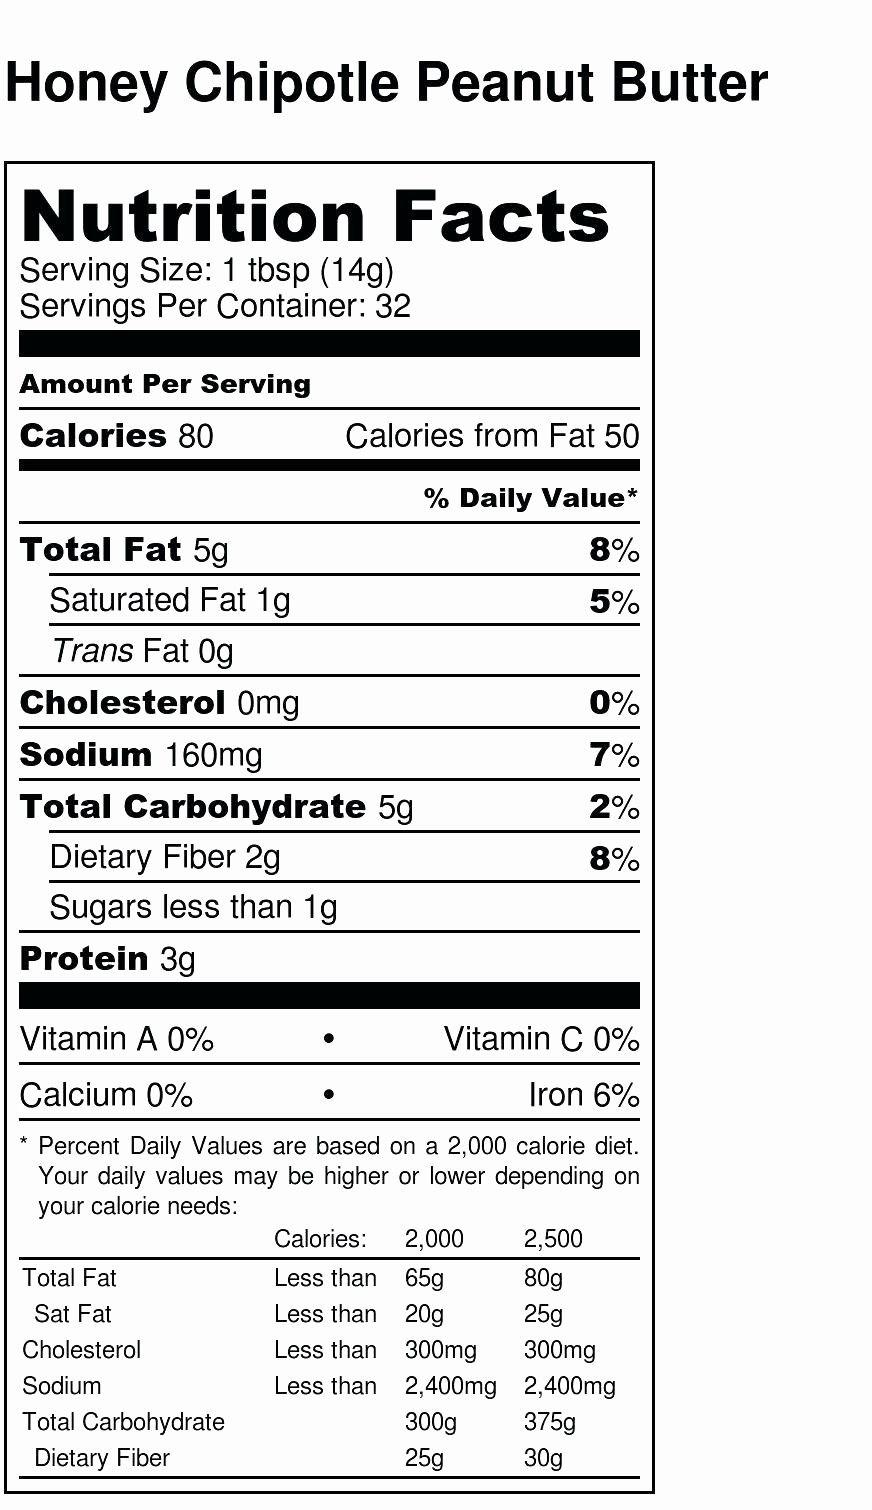 Nutrition Facts Label Template Excel Elegant Nutritional Label Template Excel Nutrition Ftempo Food Label Template Nutrition Facts Label Label Templates